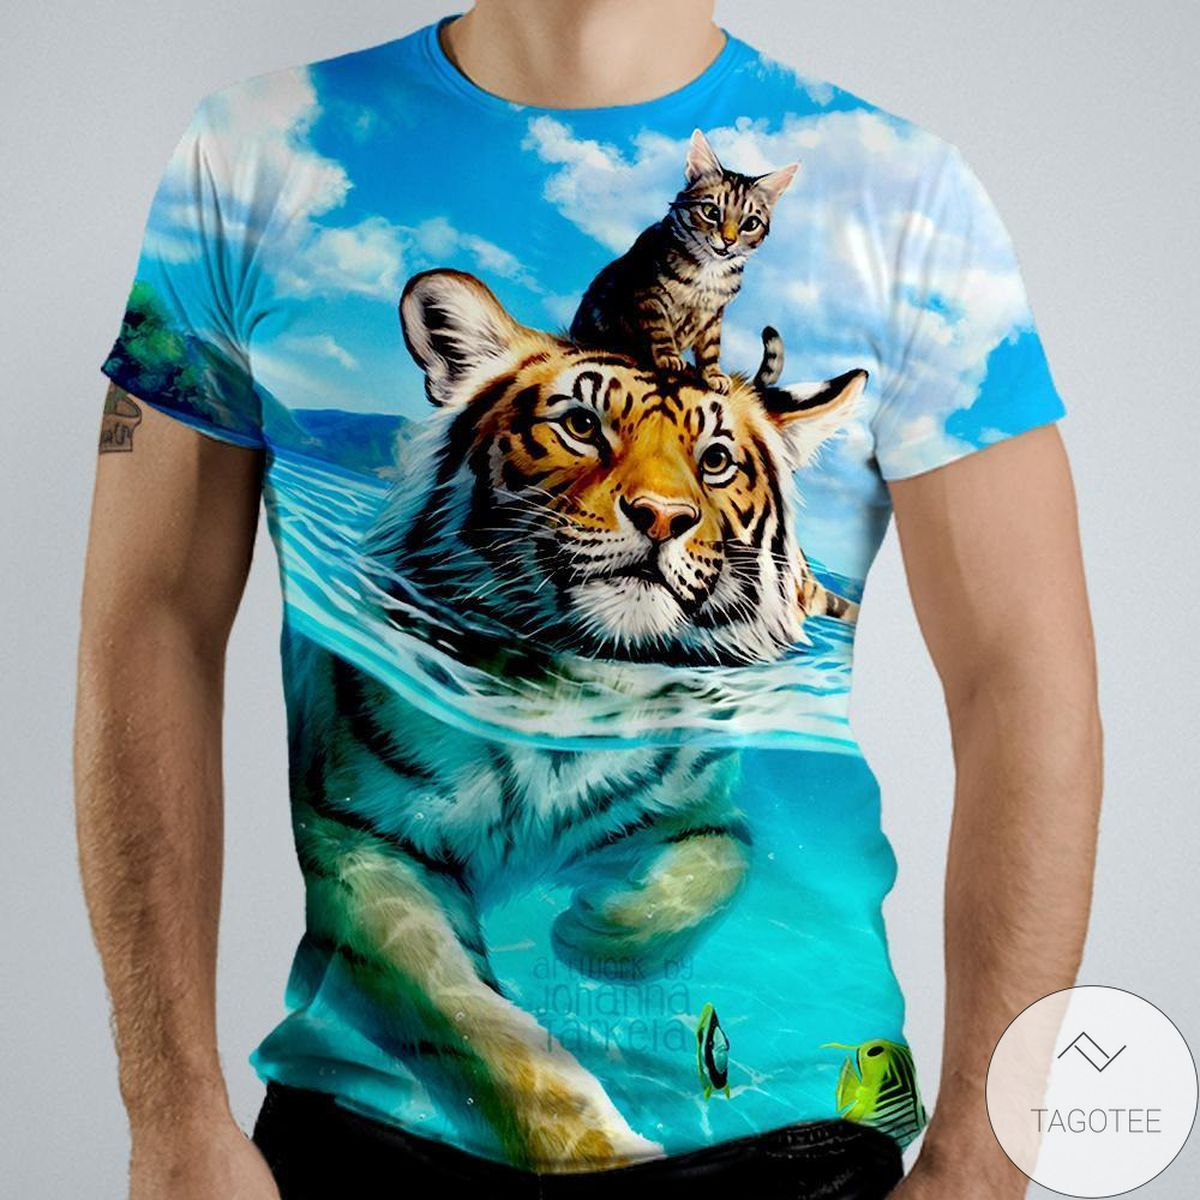 Cat & Tiger Swimming 3d Graphic Printed Short Sleeve Shirt